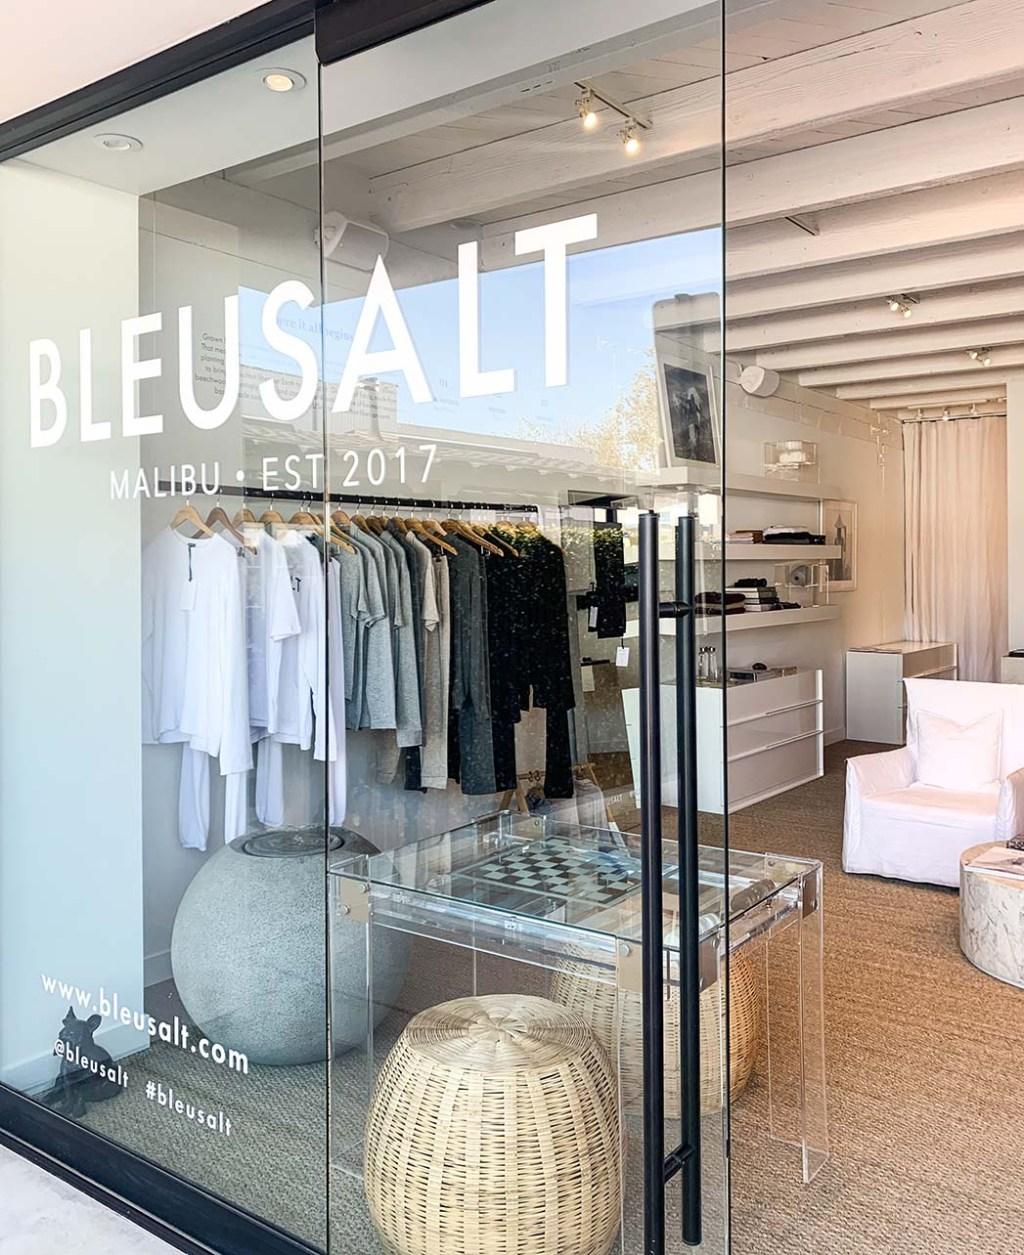 The new Bleusalt store in Malibu